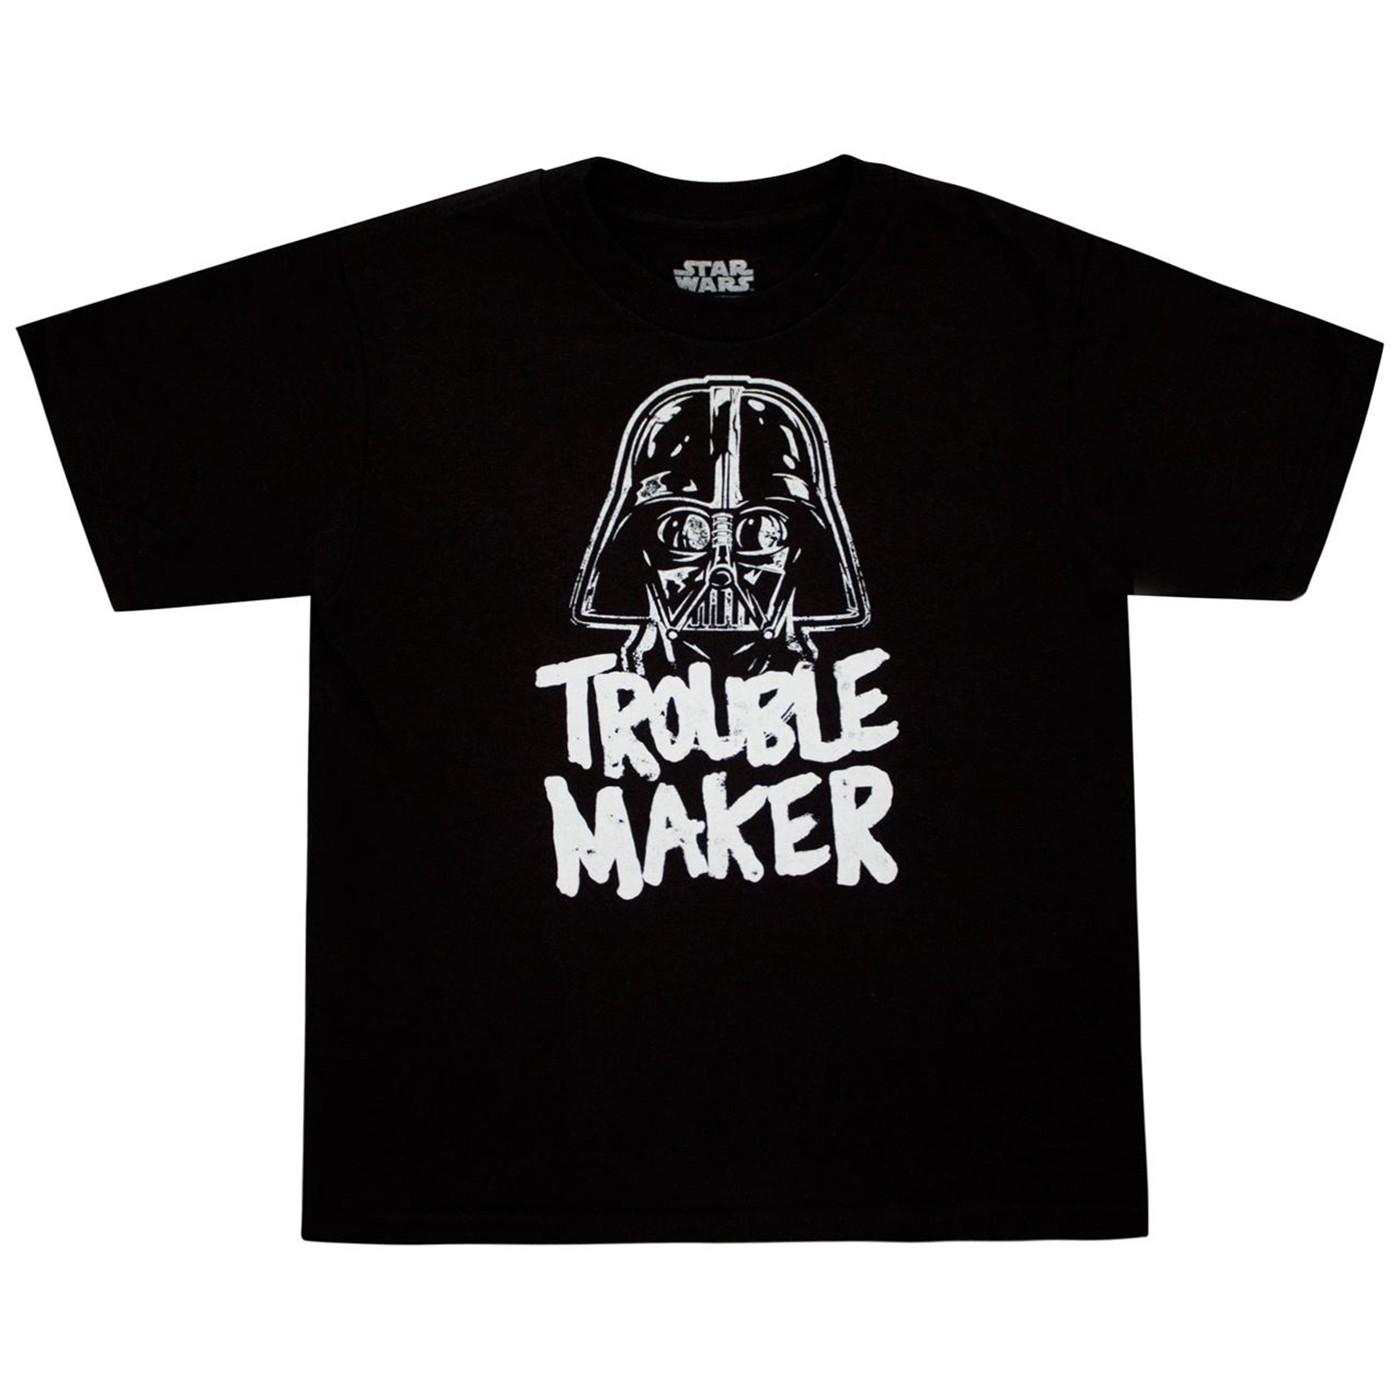 Star Wars Darth Vader Trouble Maker Toddler T-Shirt